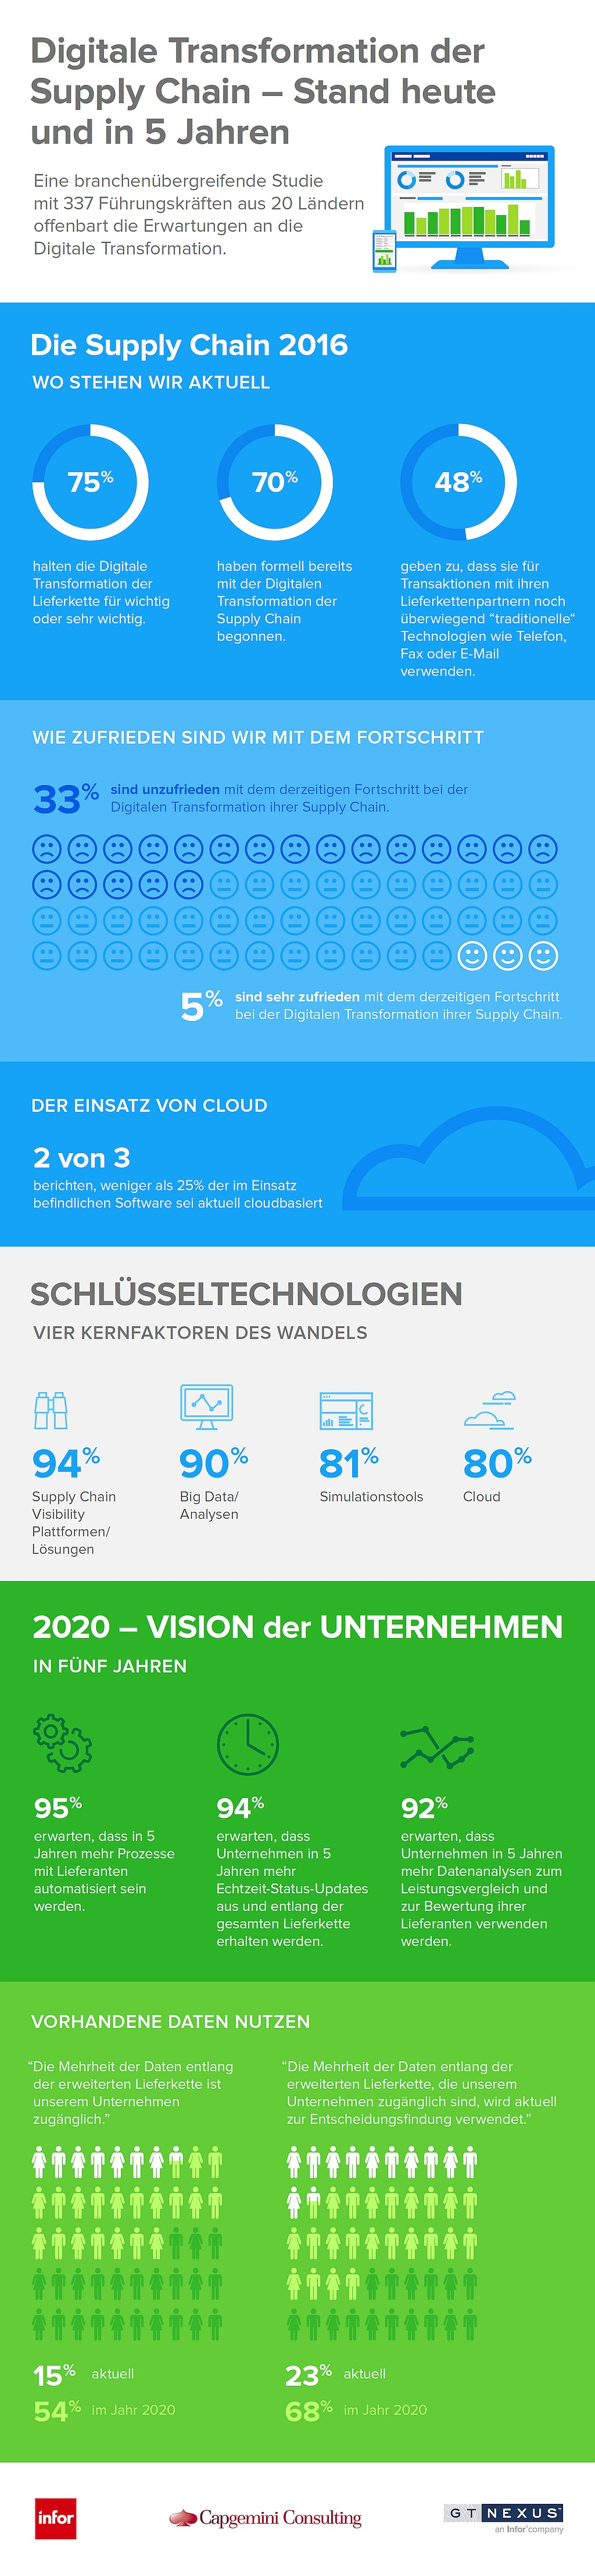 infografik capgemini digitale transformation supply chain